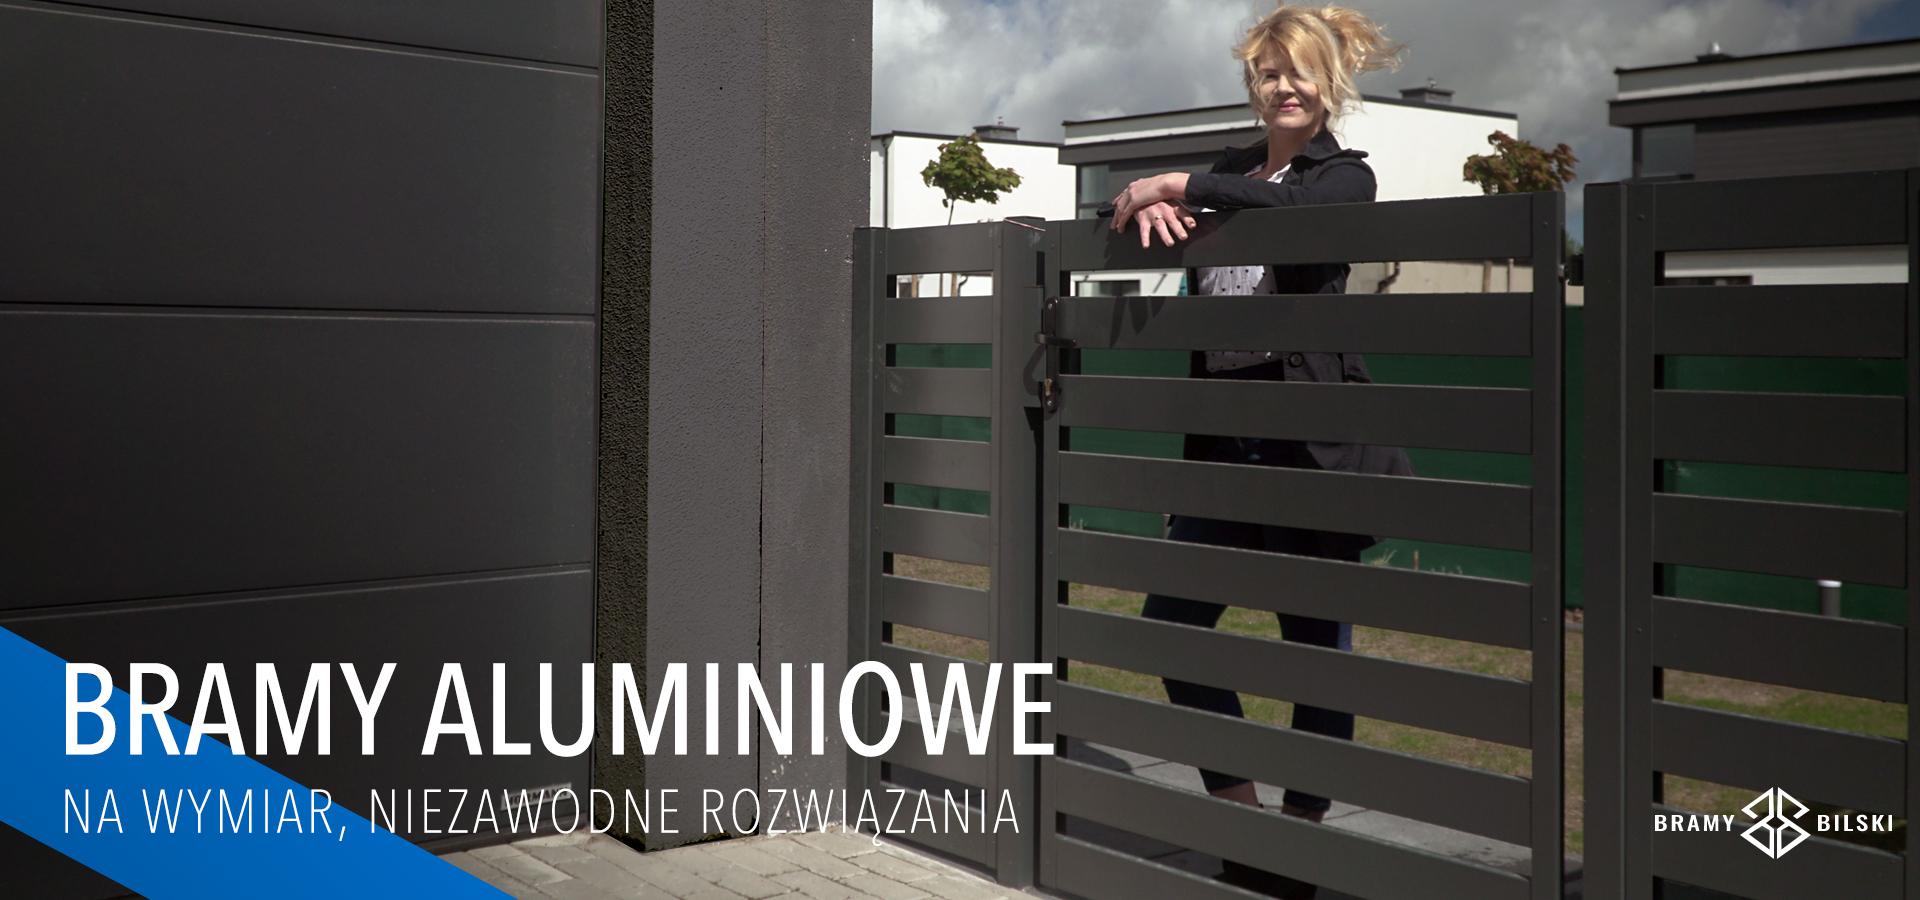 Bramy-aluminiowe-Gdynia